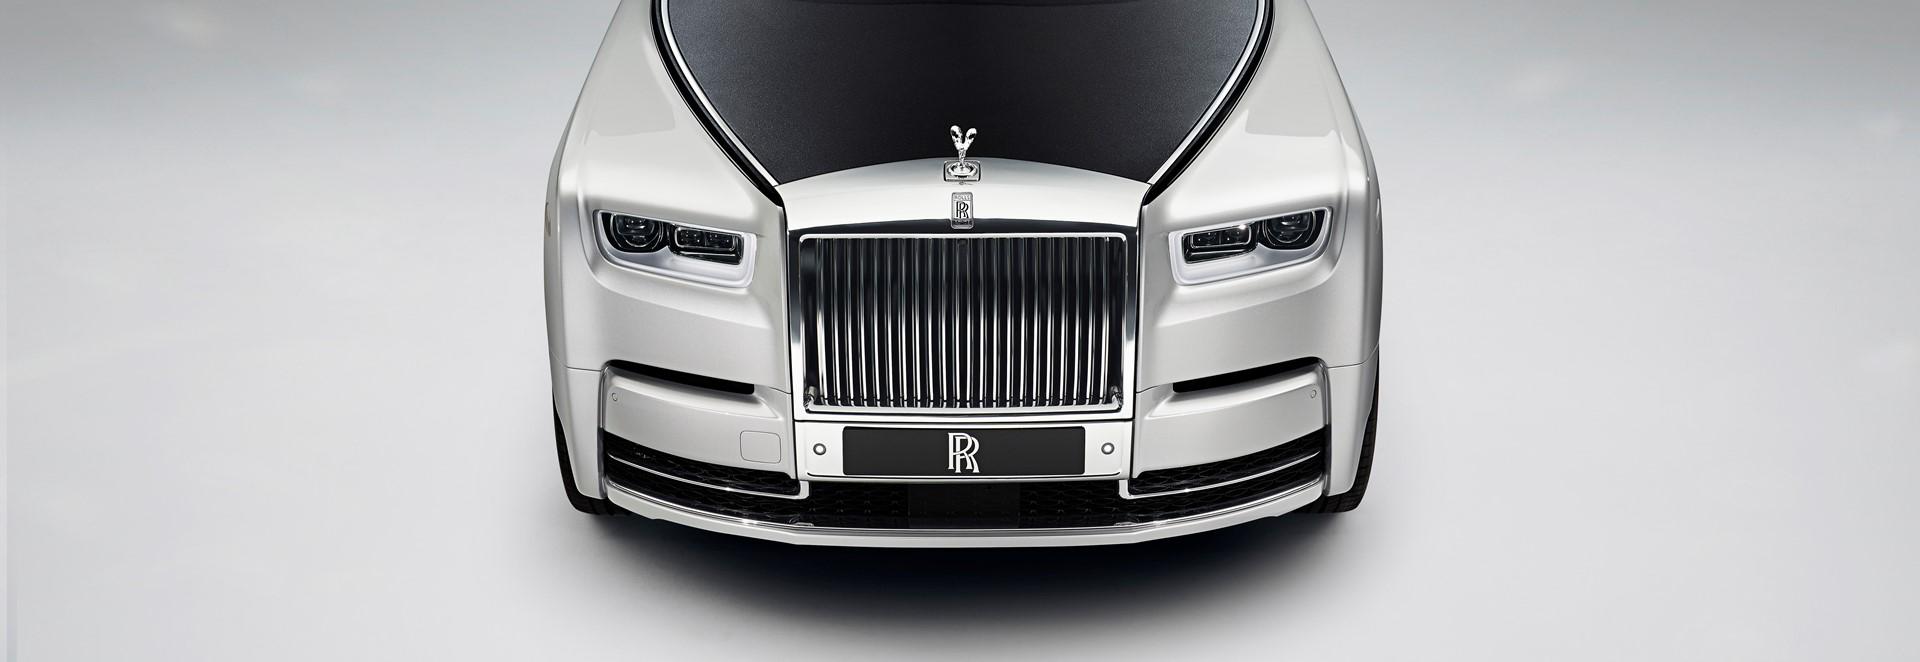 10 most comfortable cars to buy car keys. Black Bedroom Furniture Sets. Home Design Ideas